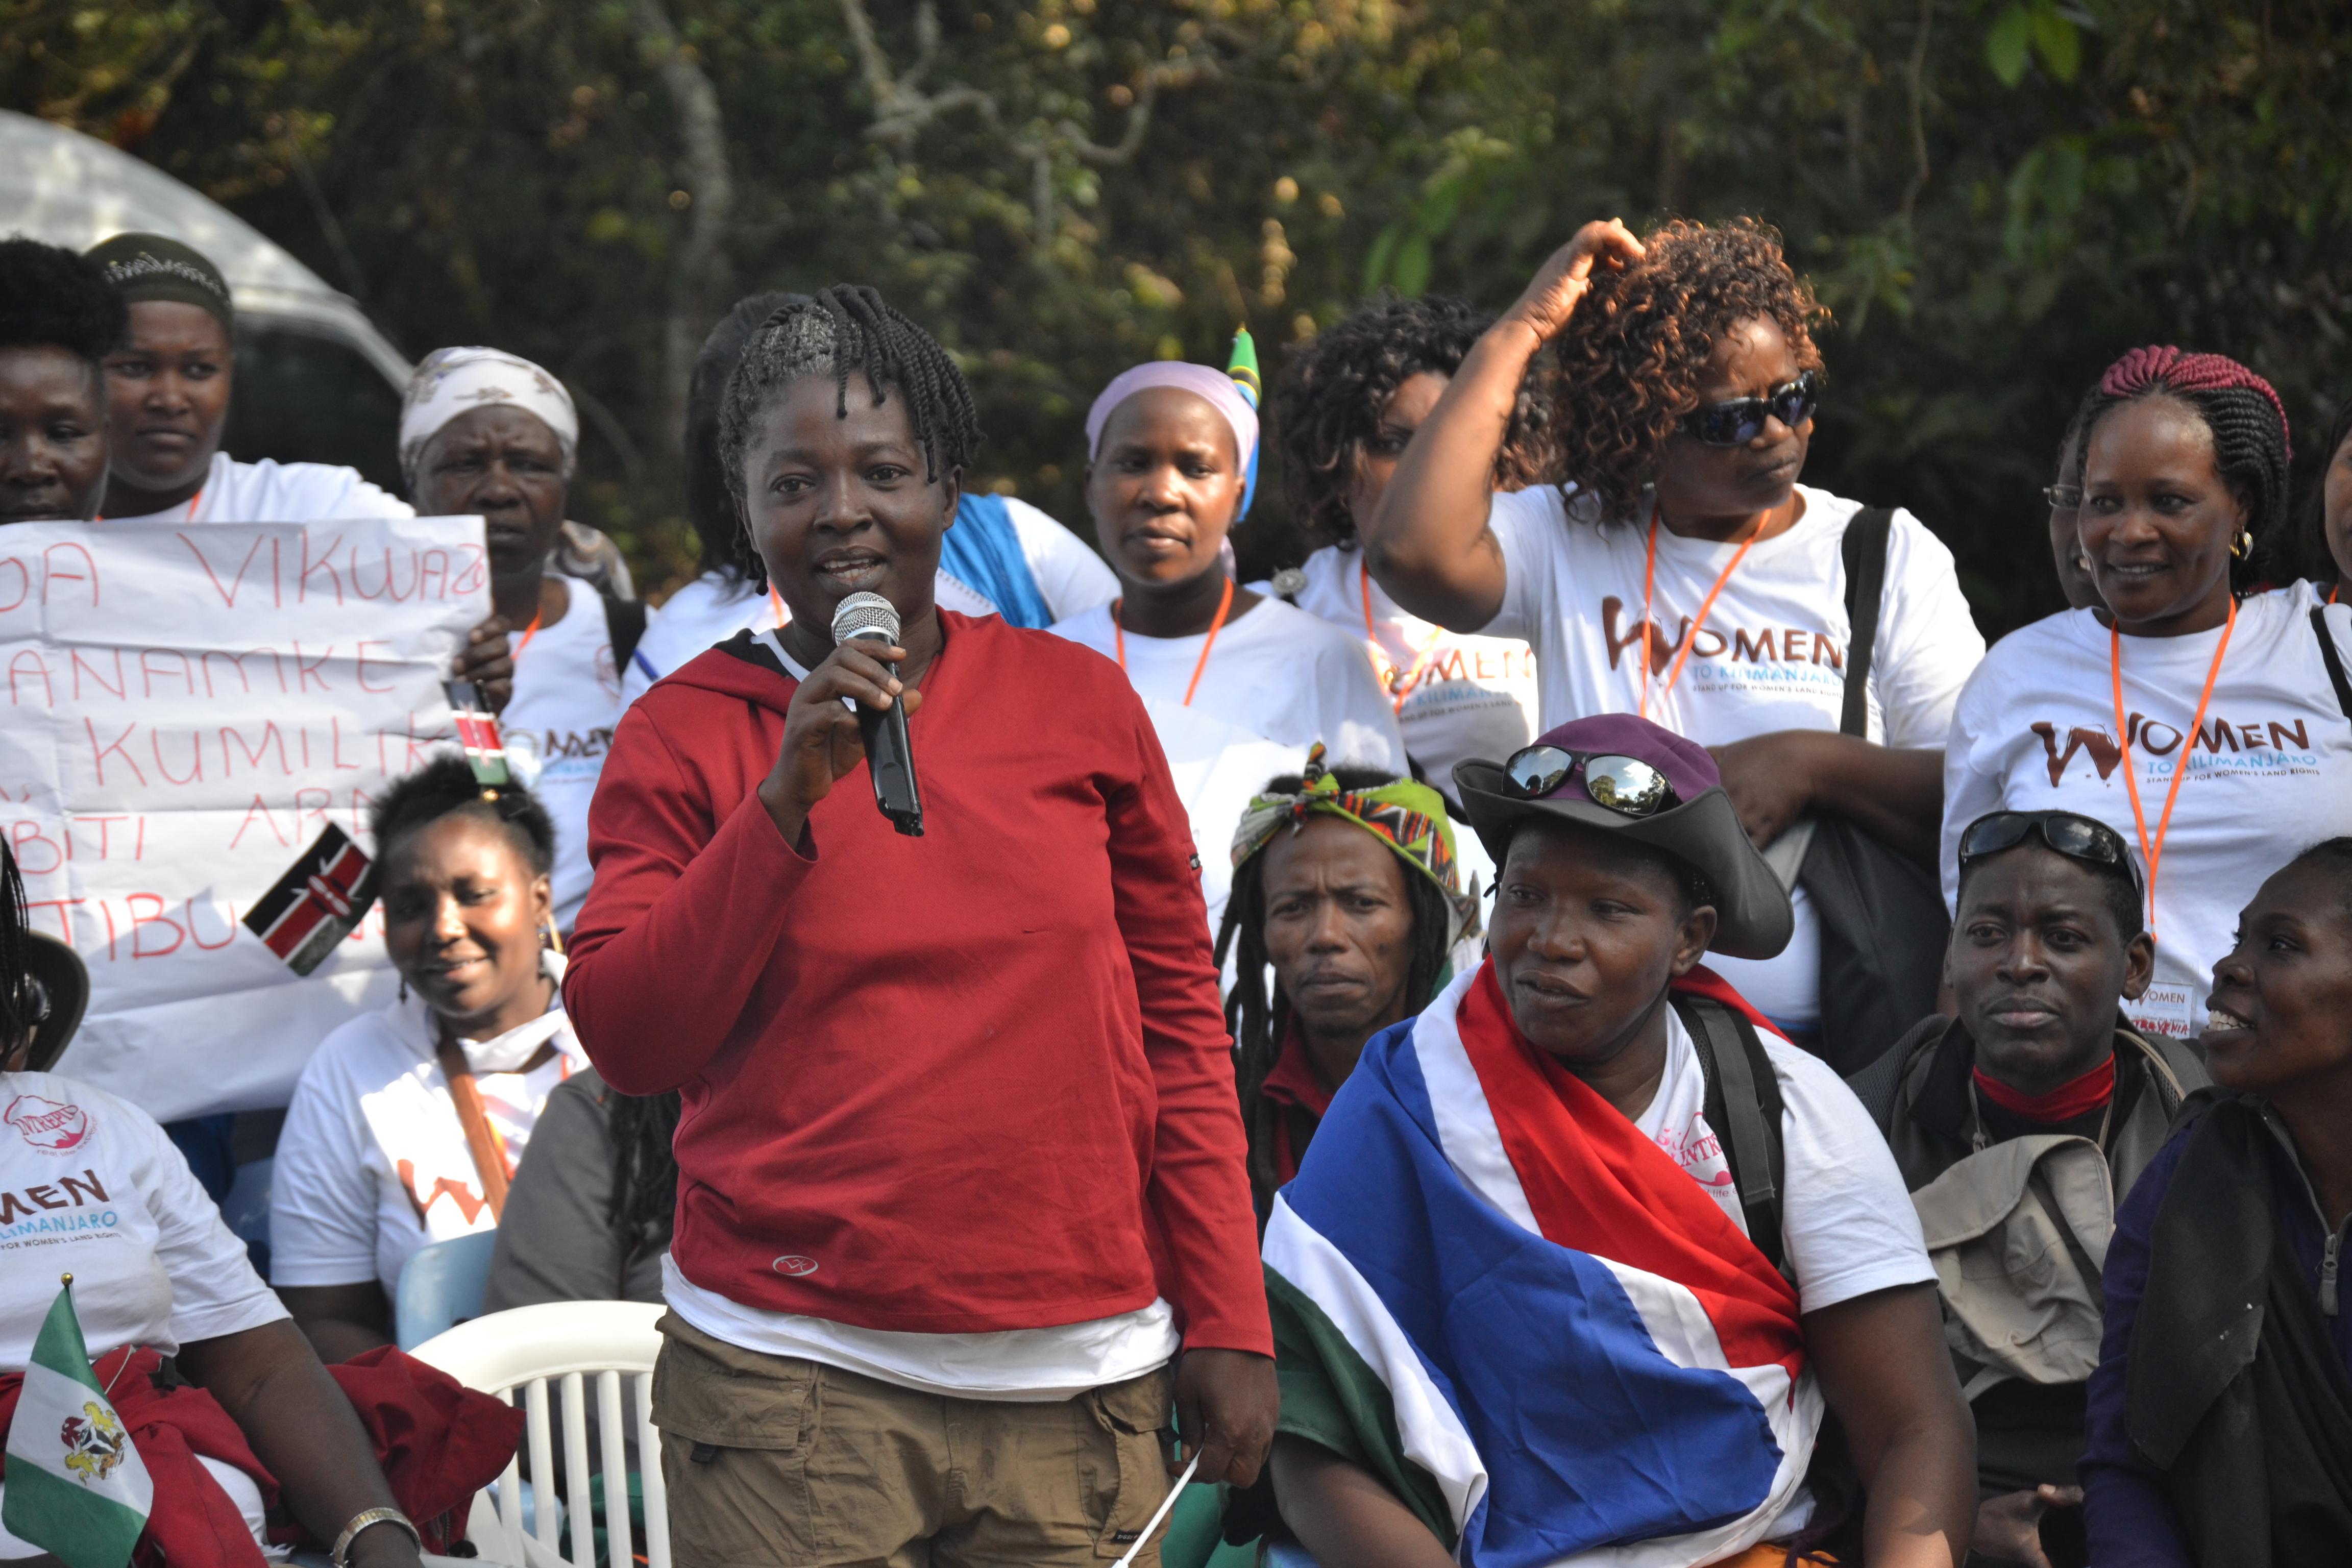 Ejima with other Kilimanjaro women land rights activists